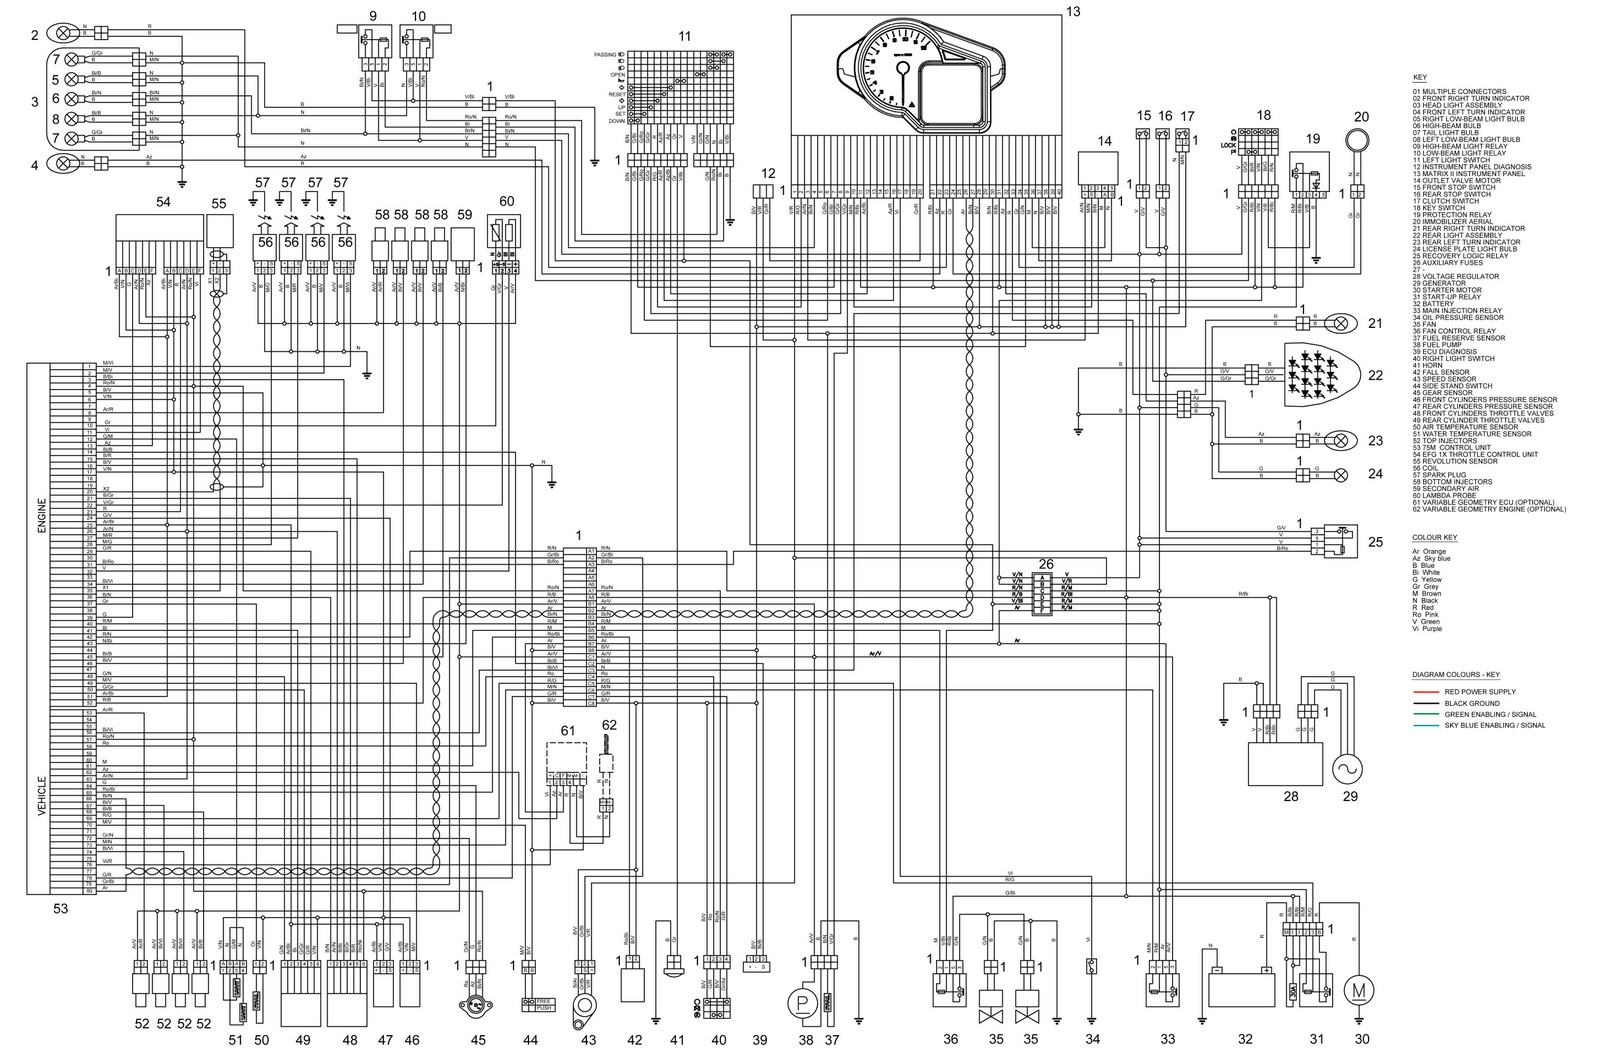 medium resolution of rsv4 wiring diagram motor gp photos aprilia rsv4 wiring diagram aprilia rsv4 wiring diagram